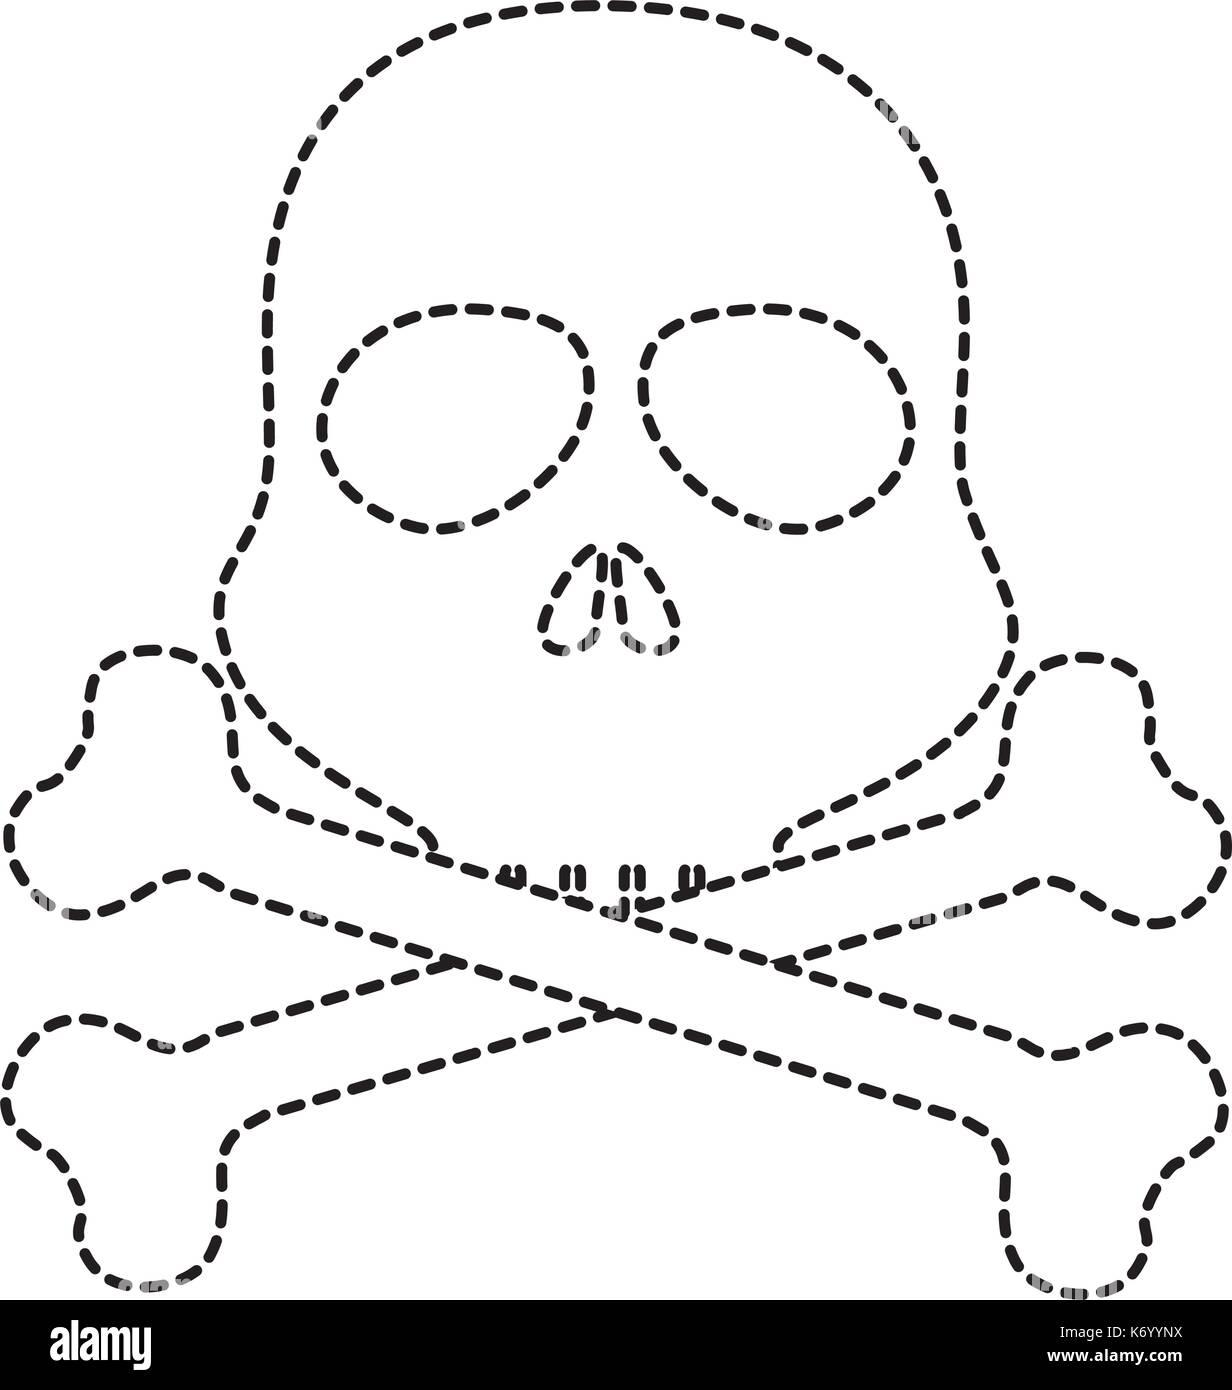 skull alert symbol icon - Stock Image